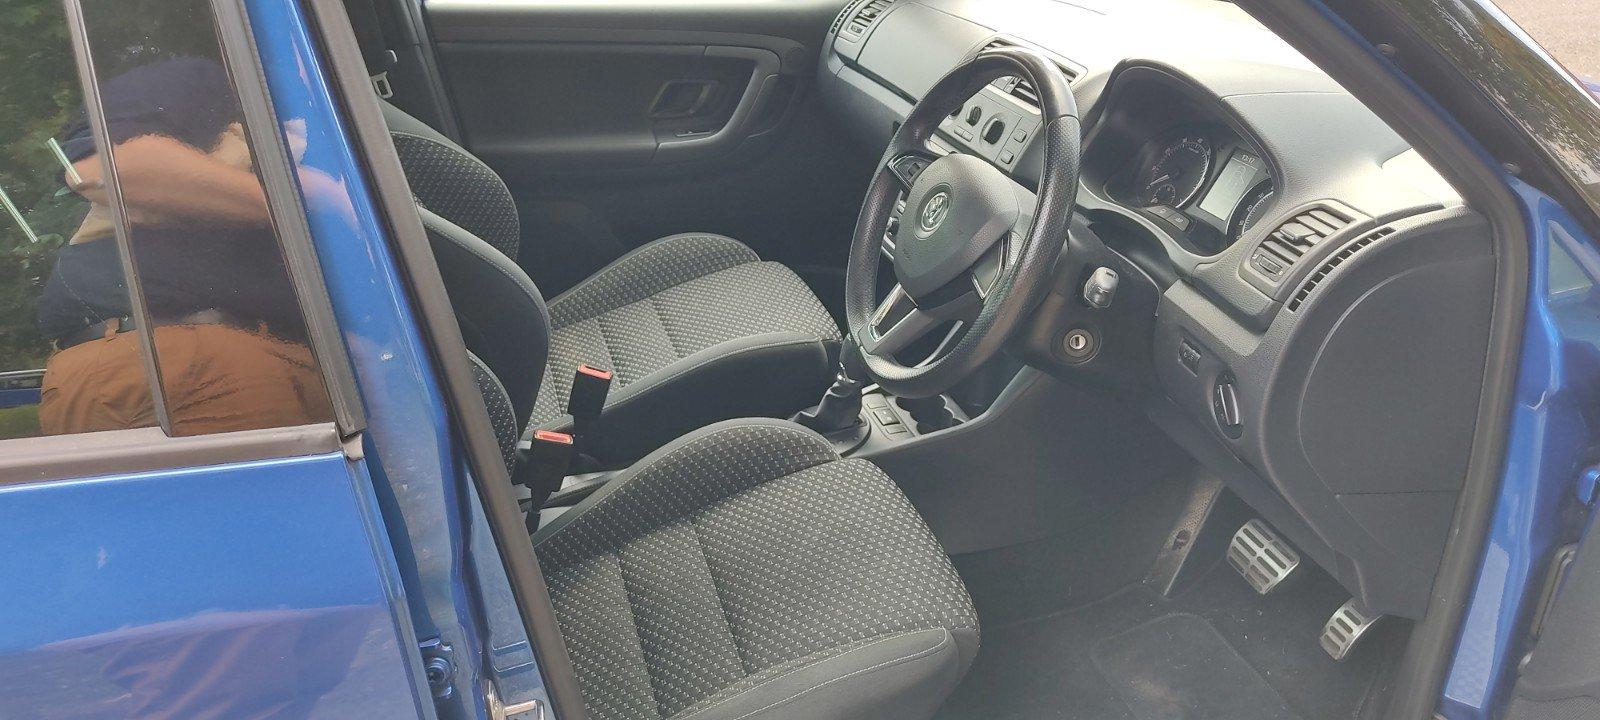 2013 Skoda Fabia VRS Hatch, FSH, 57k miles, Blue For Sale (picture 3 of 6)